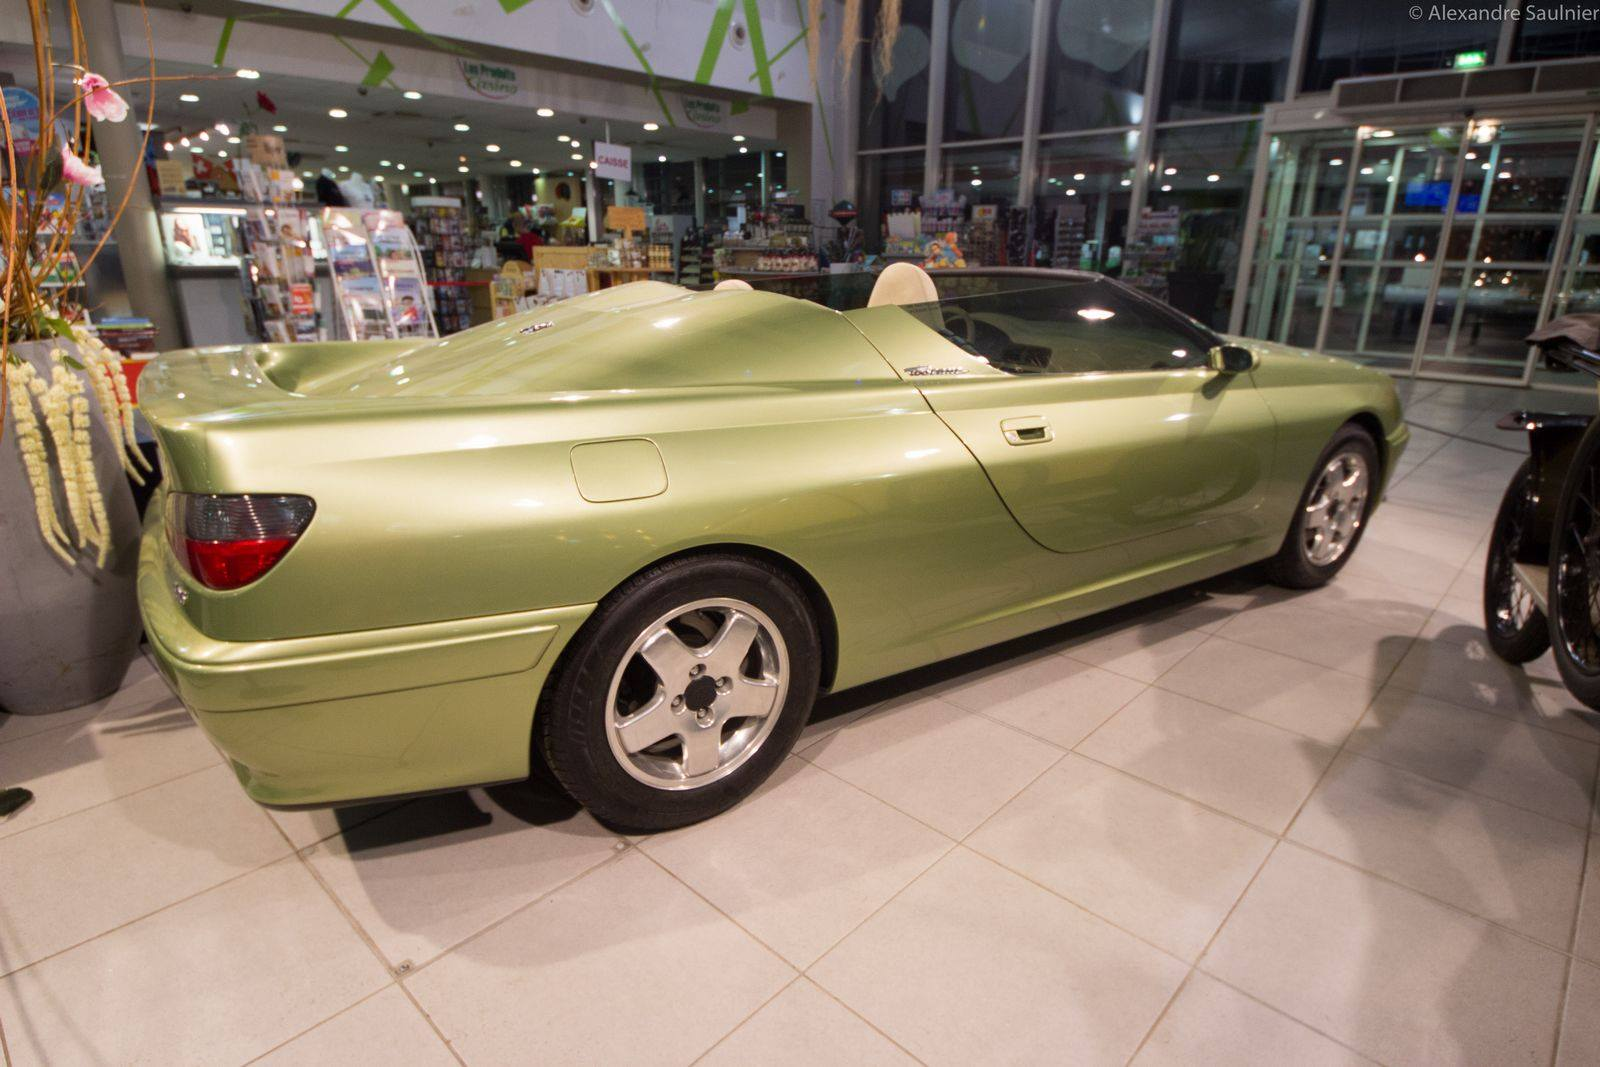 Peugeot-406-Toscana-Concept--1996--2